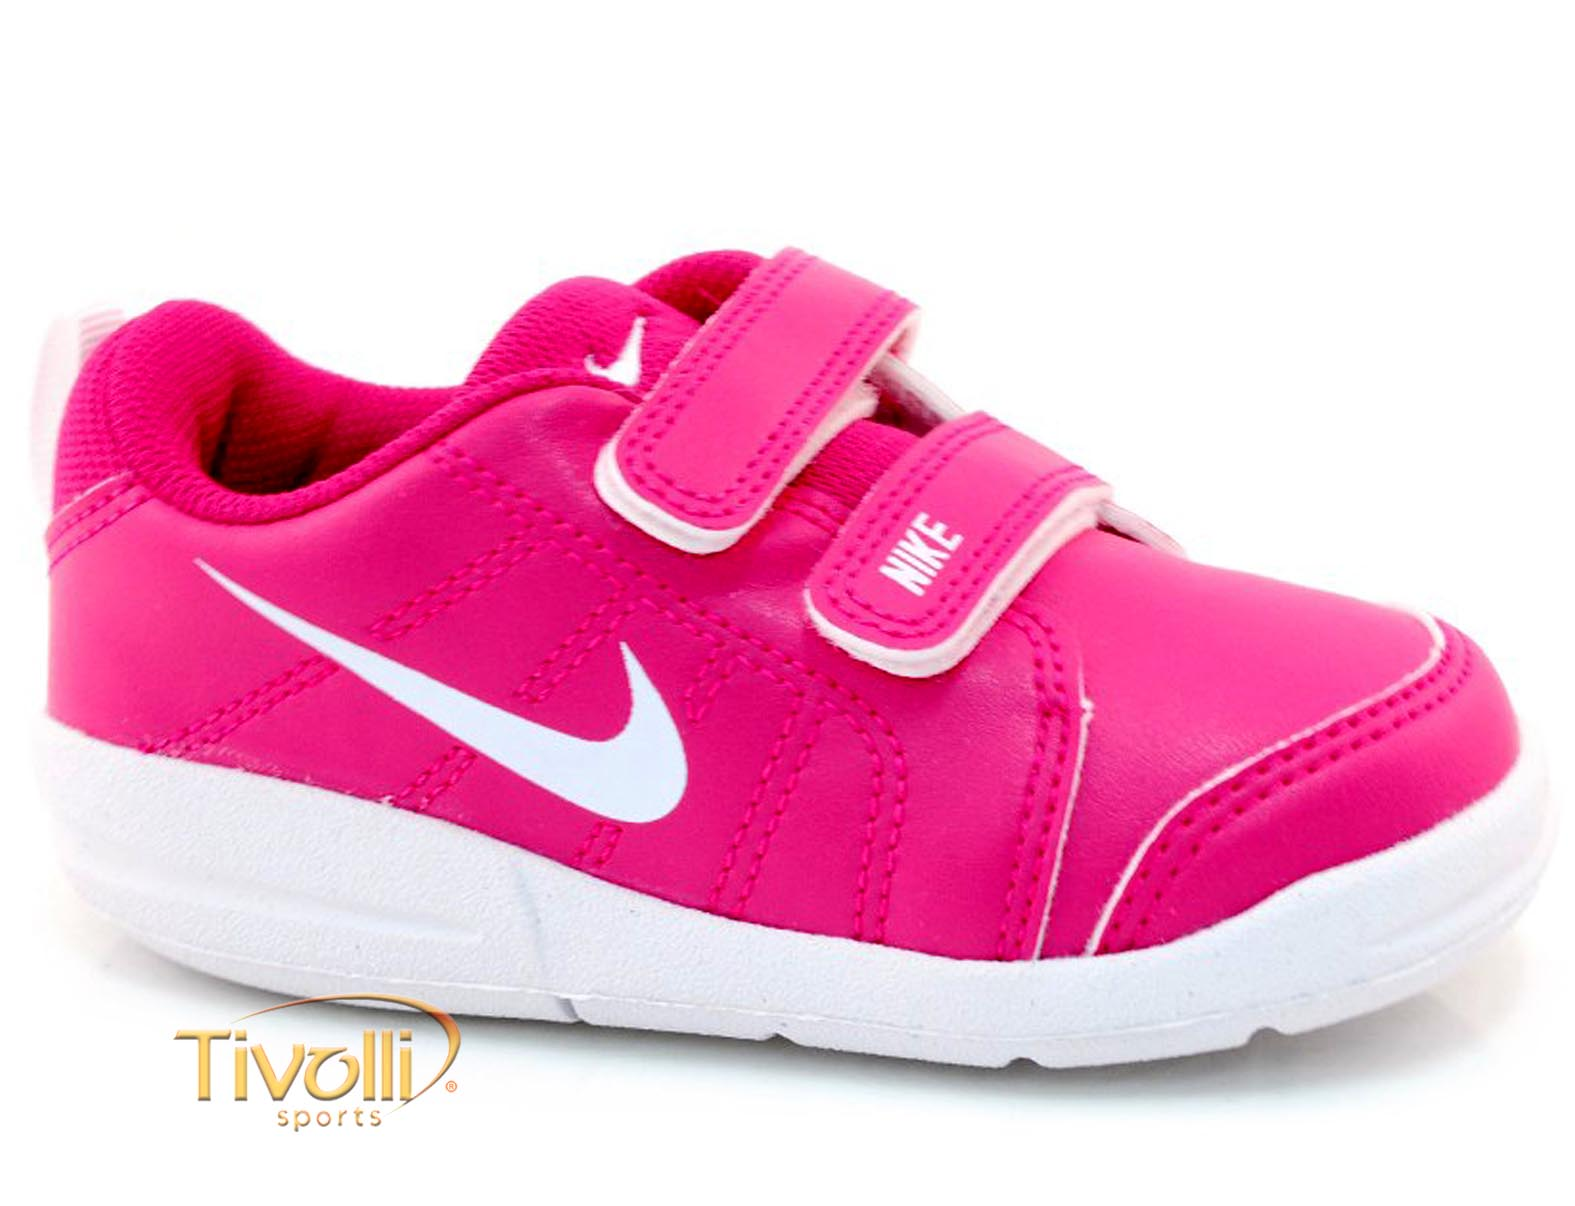 3a651ae46d Tênis Nike Pico LT (PSV) Infantil   tam. 27 ao 33